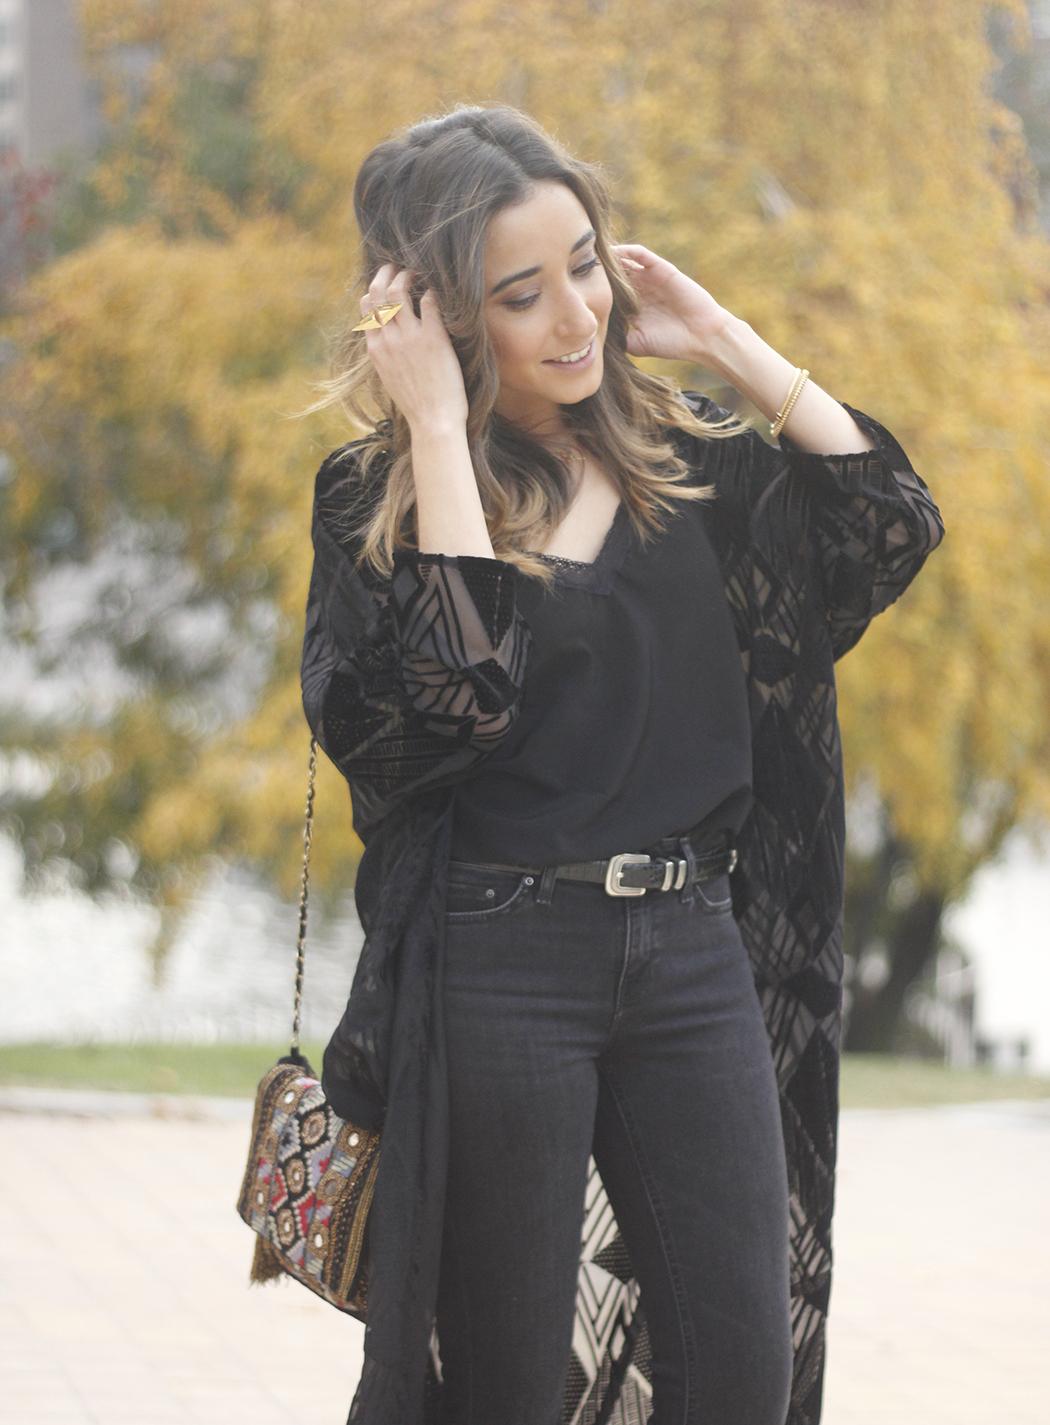 Black Kimono Black flared jeans outfit23